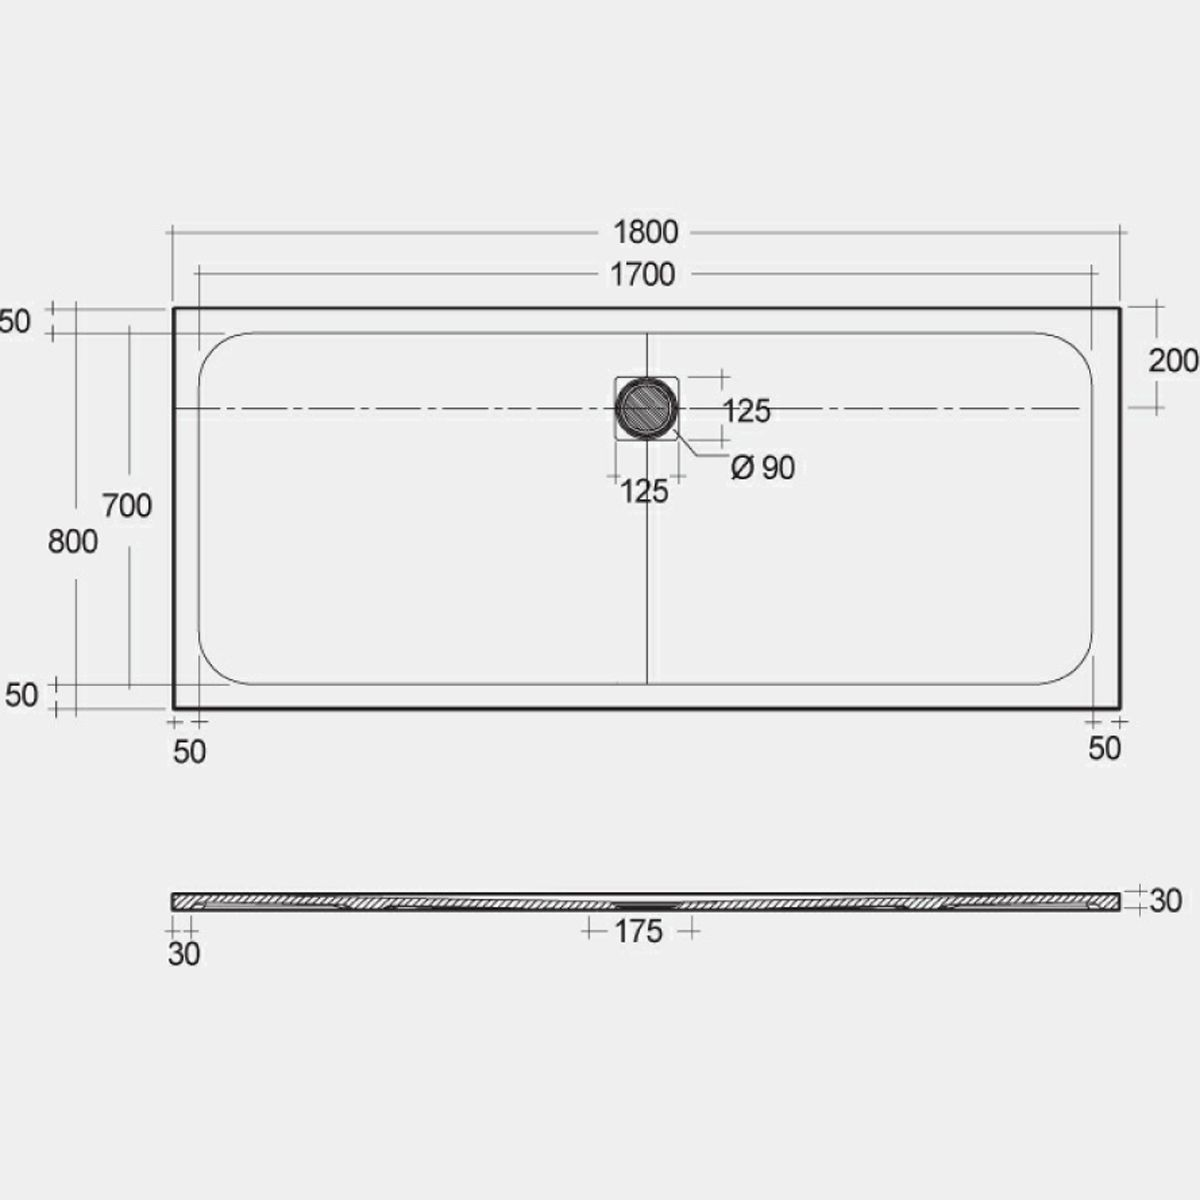 RAK Feeling Cappuccino Rectangular Shower Tray 1800 x 800mm Measurements